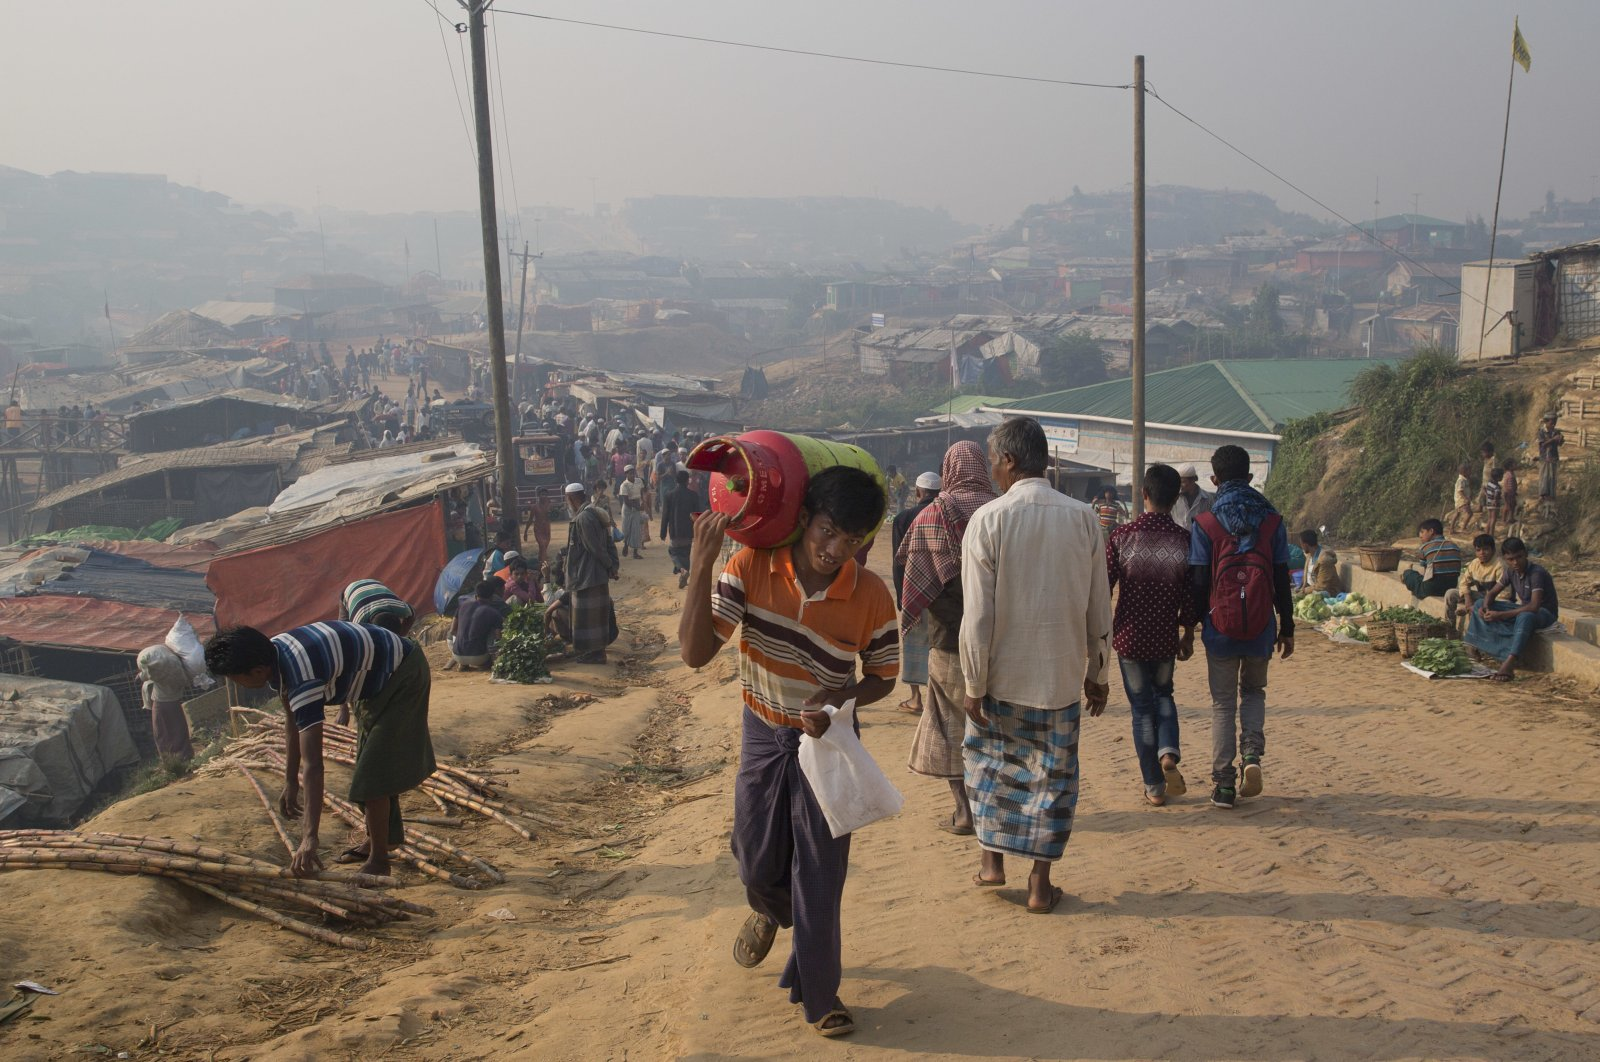 A Rohingya refugee walks carrying a cooking gas cylinder inside Balukhali refugee camp near Cox's Bazaar, Nov. 17, 2018. (AP Photo)